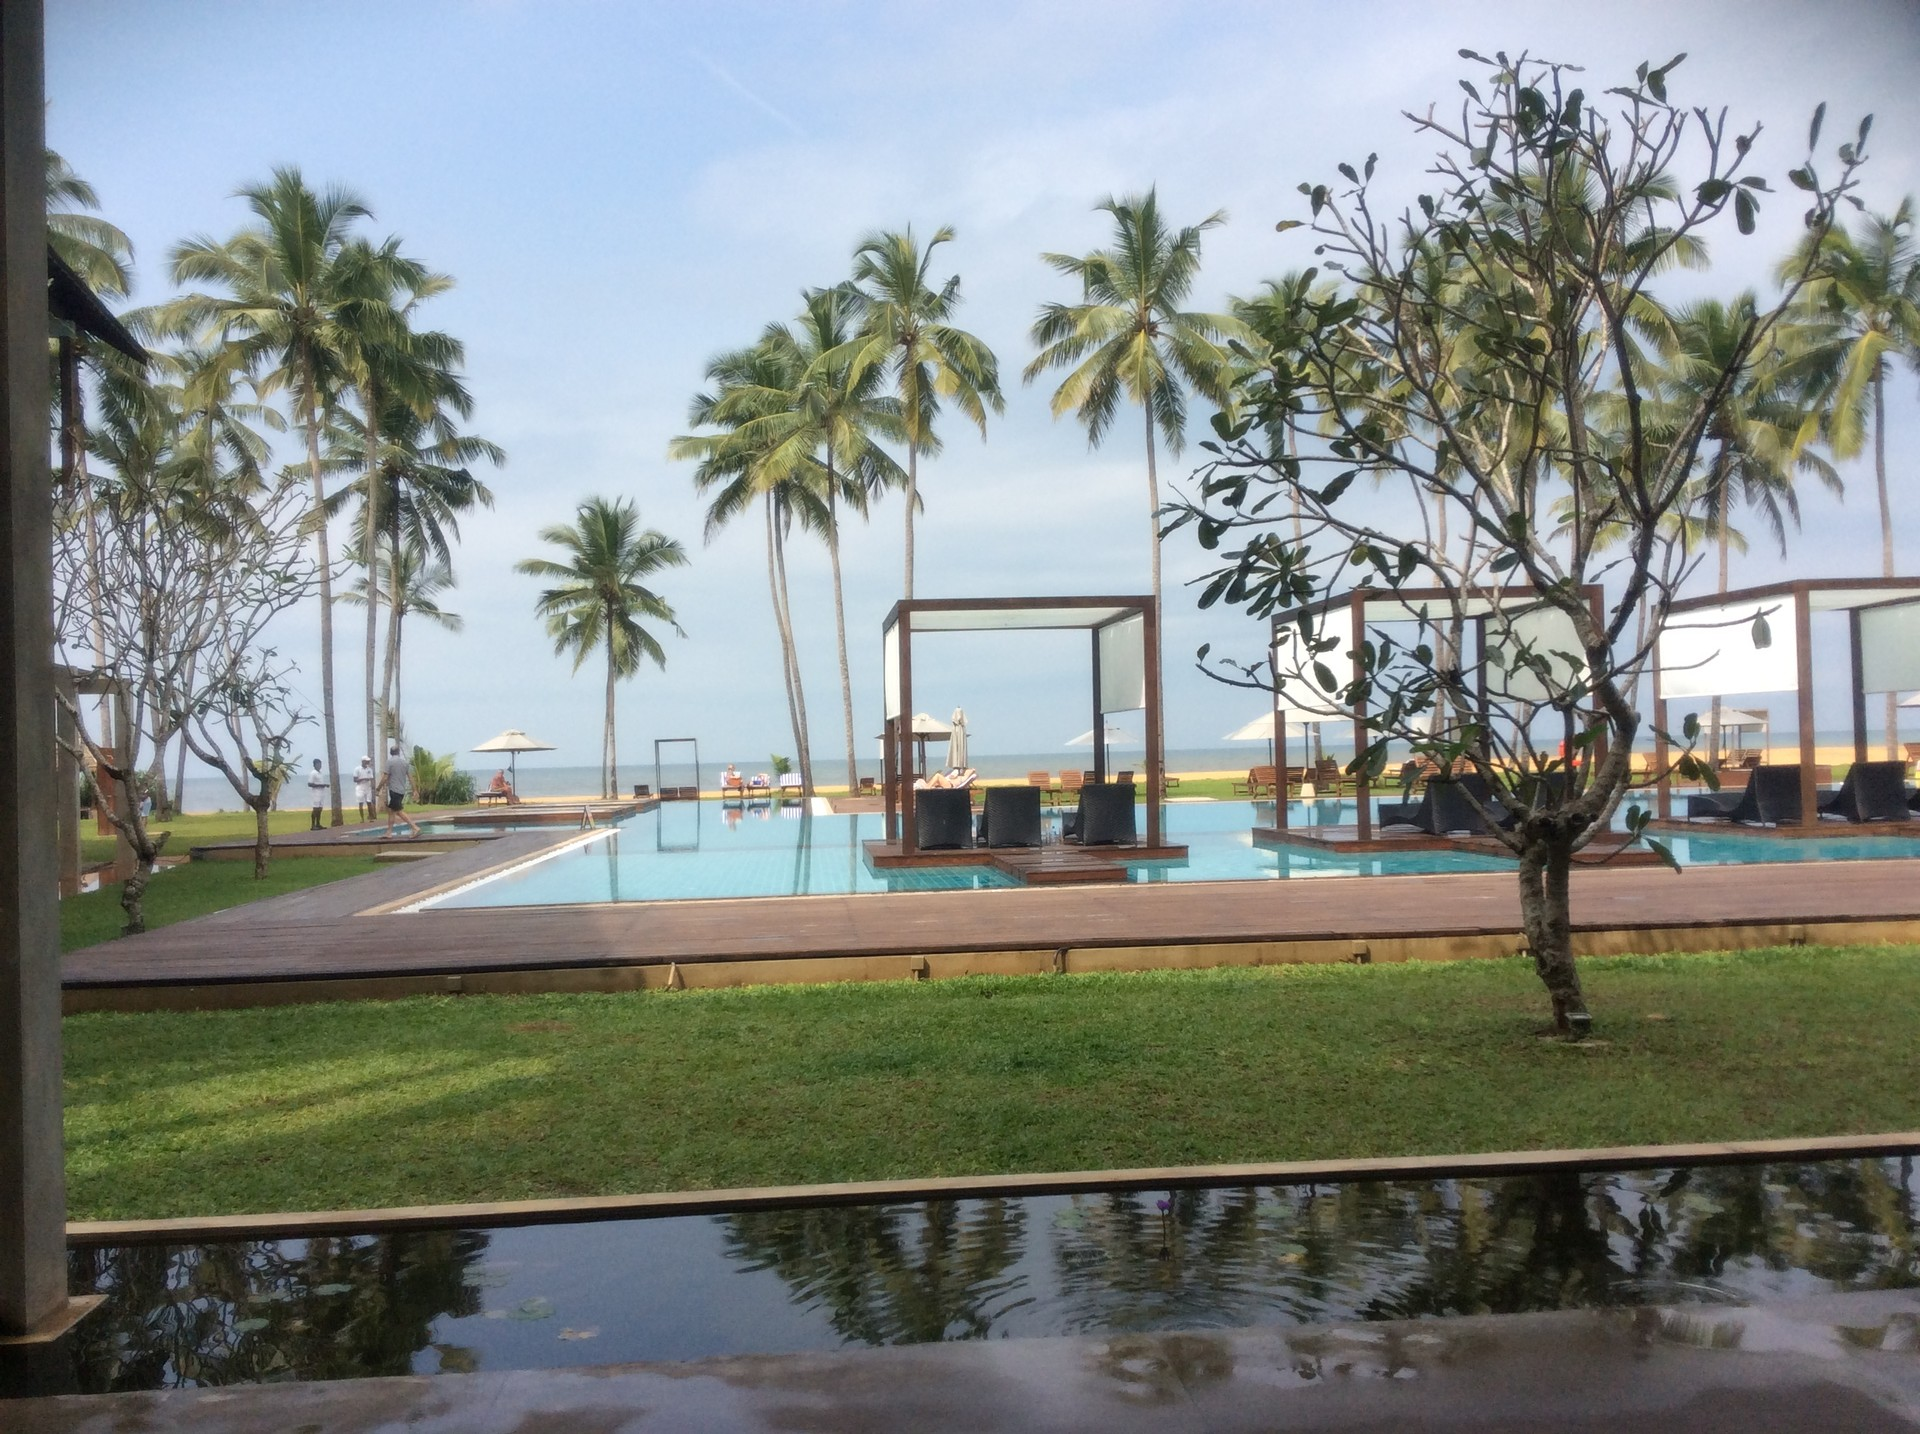 Suriya resort, Waikkal, Sri Lanka